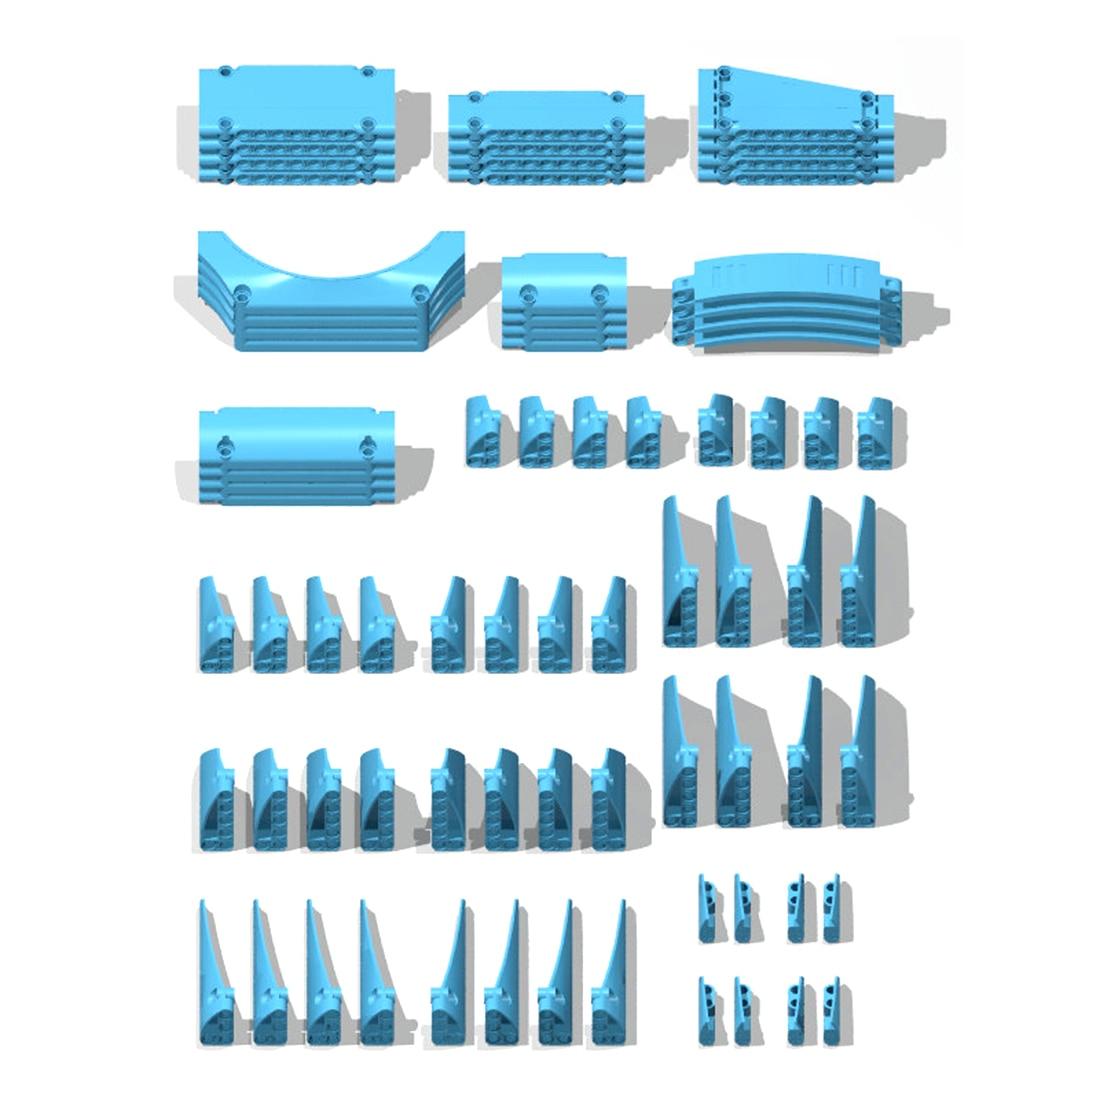 DIY Educational high-tech Parts Panel Parts For Standard Building Block Brands Toys - Sky-Blue/Dark Blue/Yellow/Red/Black/Orange